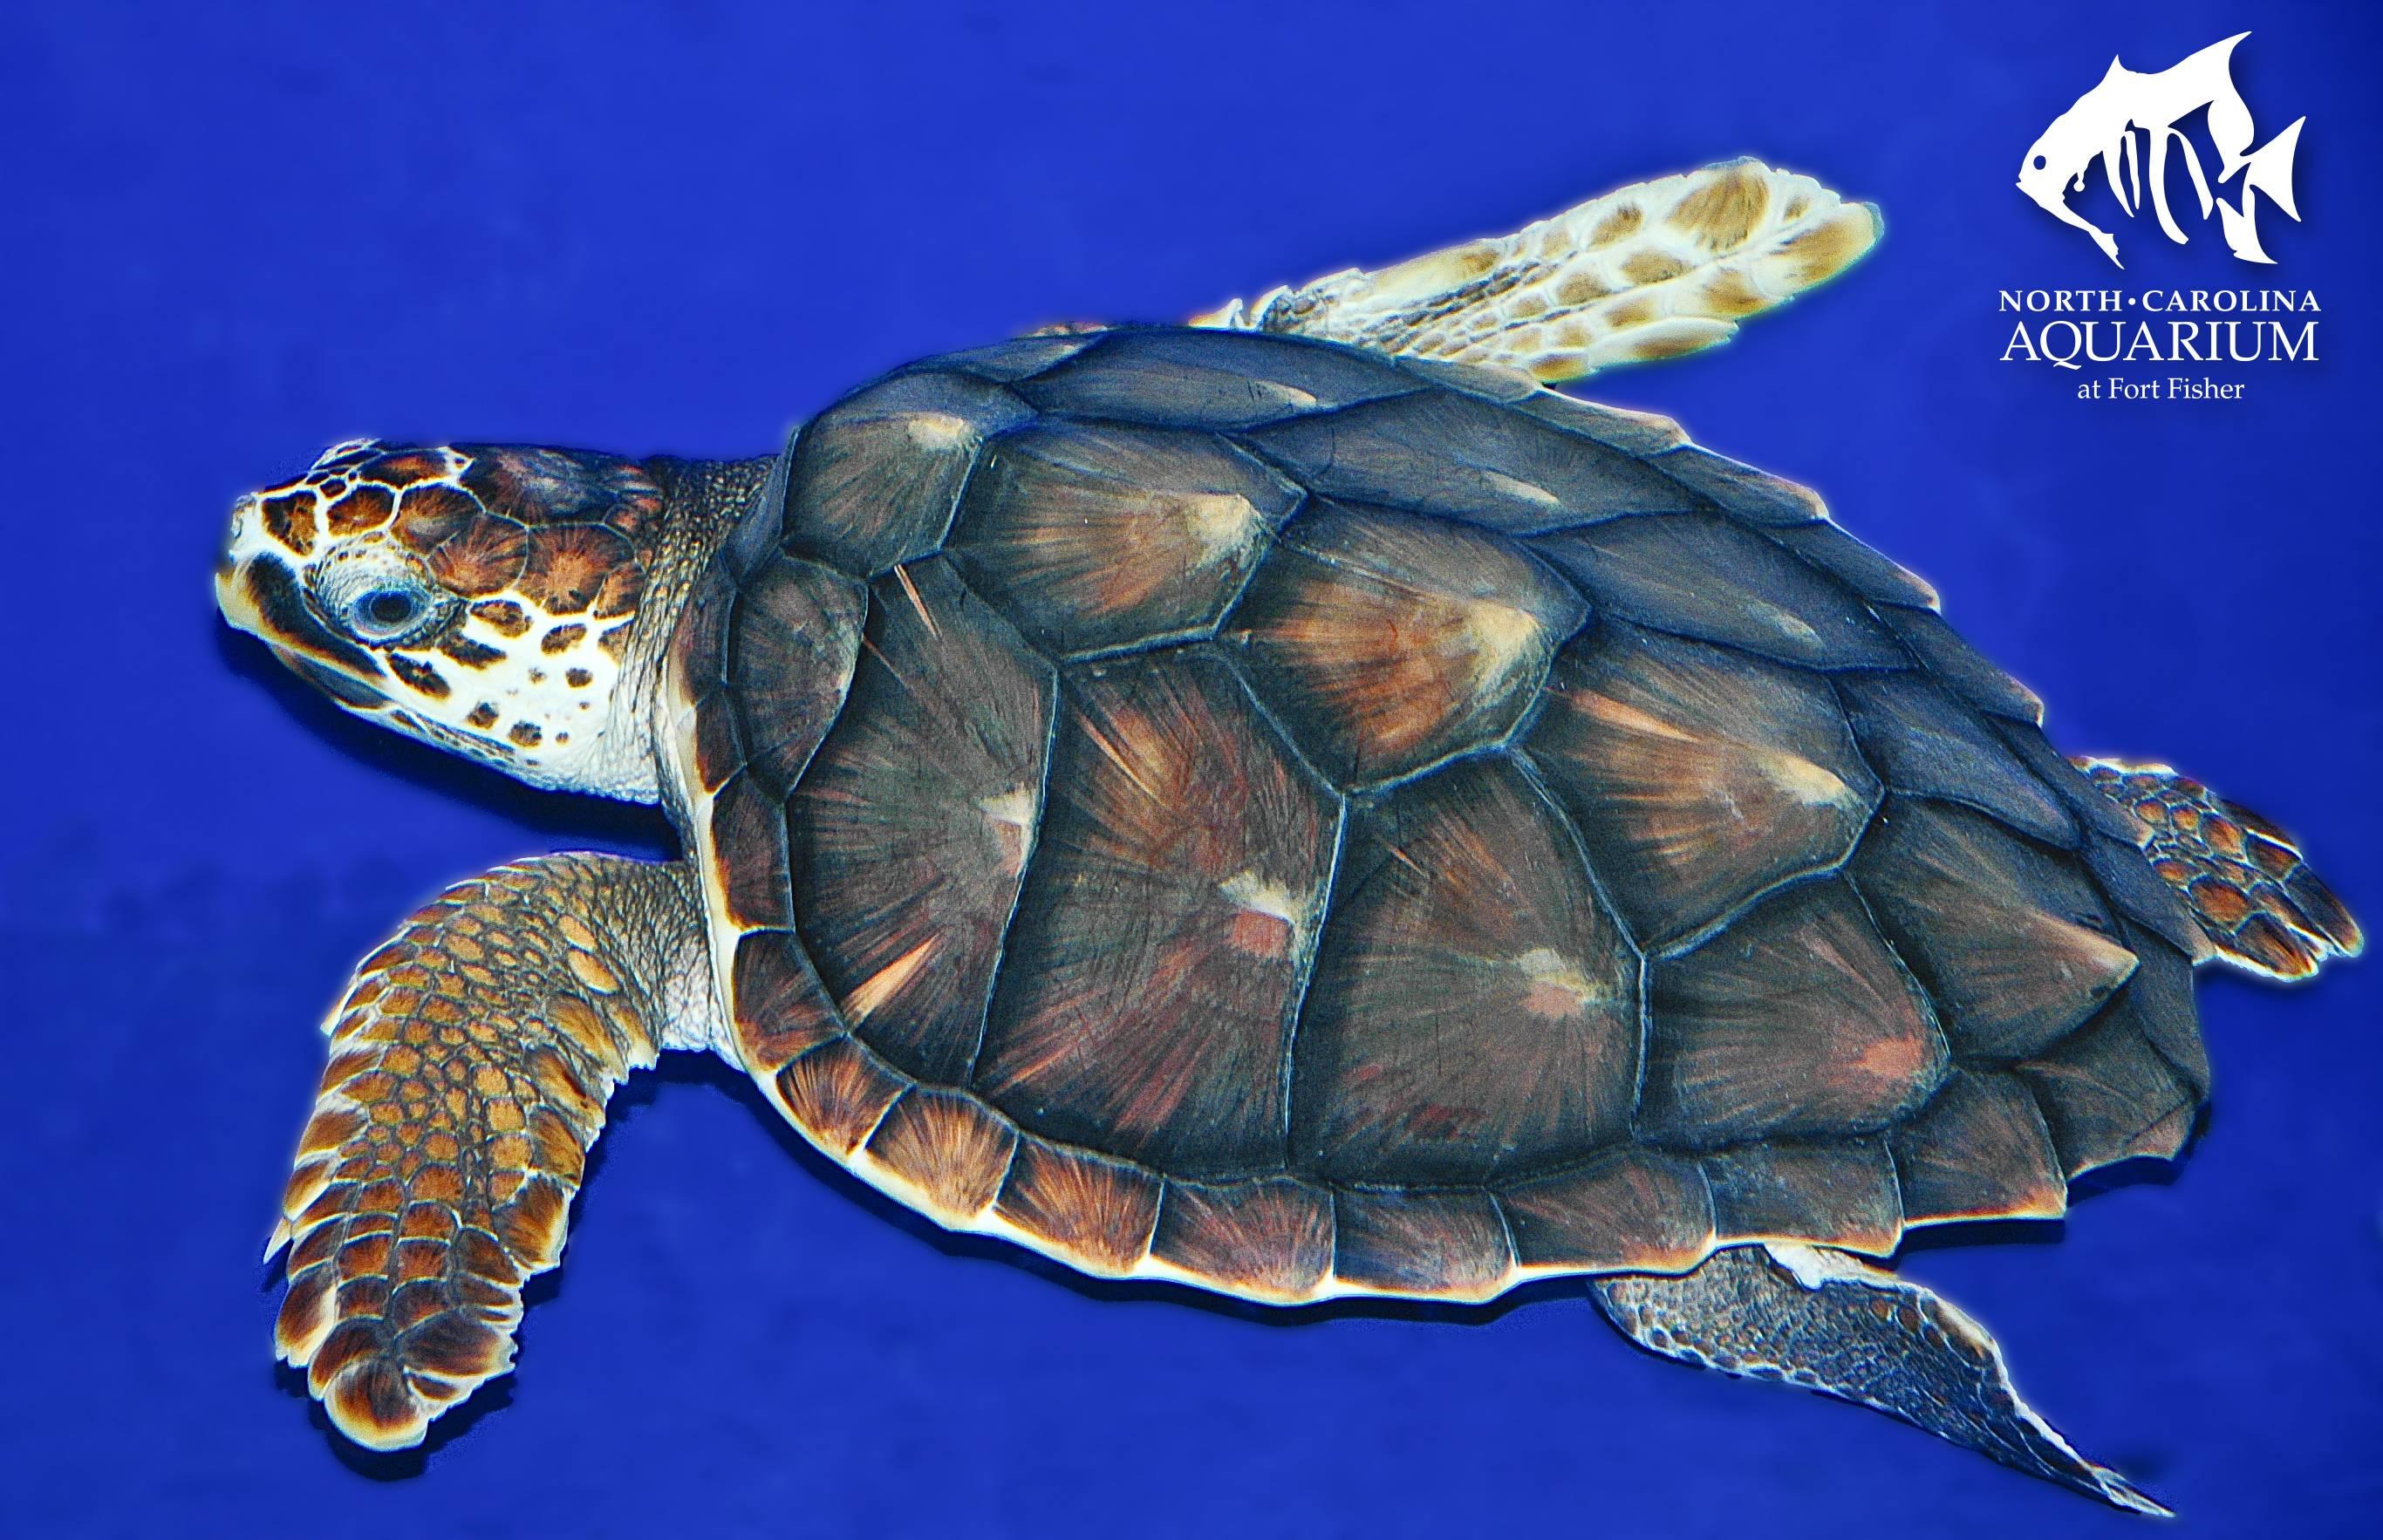 Chelonia mydas (зеленая черепаха, суповая черепаха)